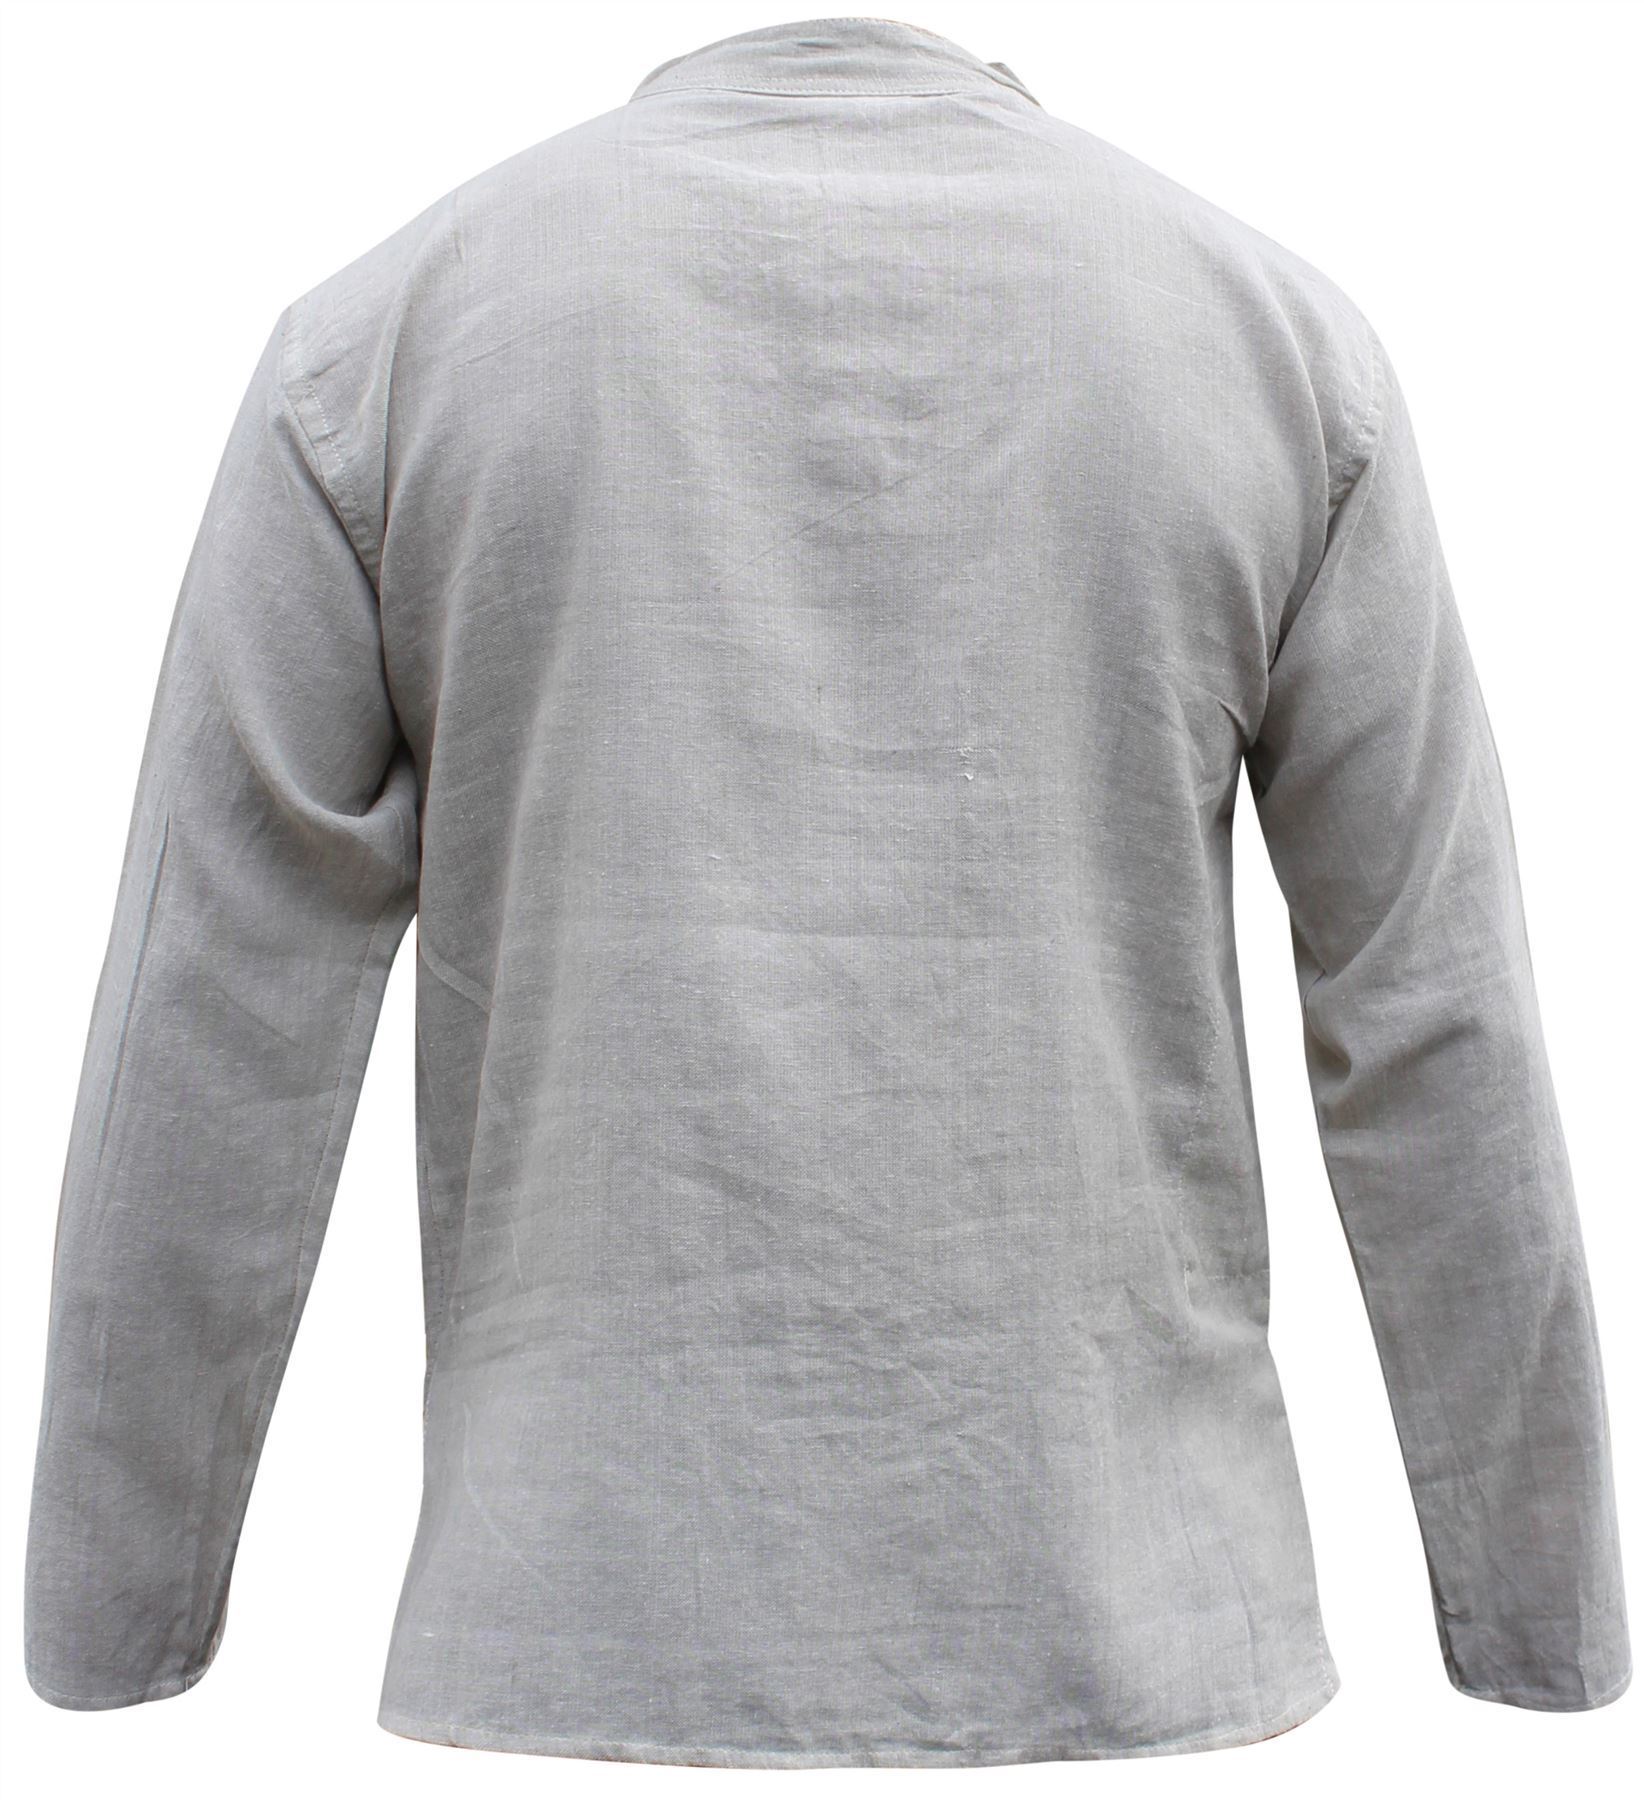 Mens-Plain-Hemp-Collarless-Grandad-Shirt-Full-Sleeved-Hippie-Summer-Light-Tops thumbnail 18